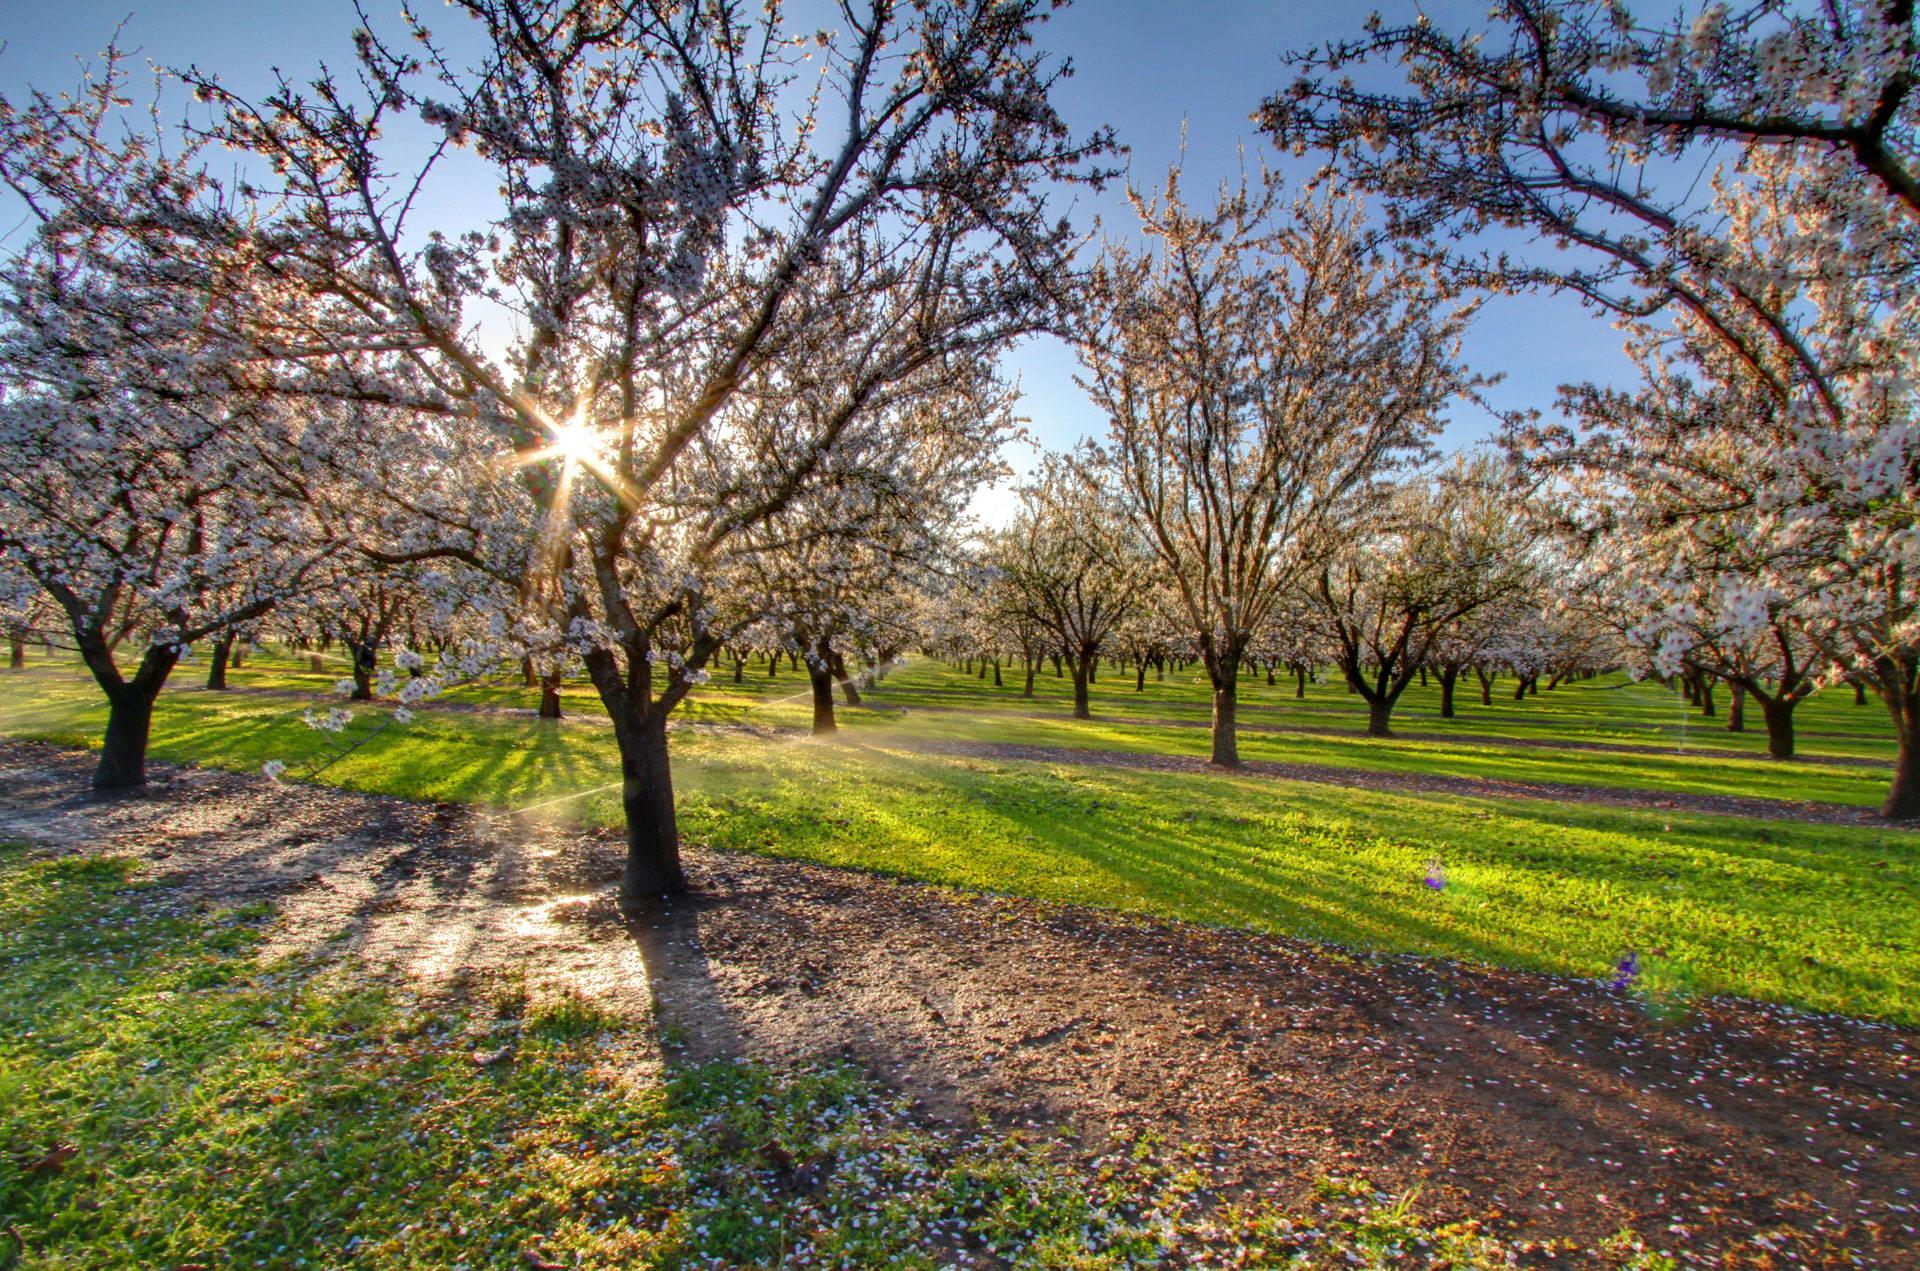 "An almond orchard in the Sacramento Valley, near Chico. <a href=""https://flic.kr/p/bAteuc"" target=""_blank"">Nicholas D. via Flickr</a>"